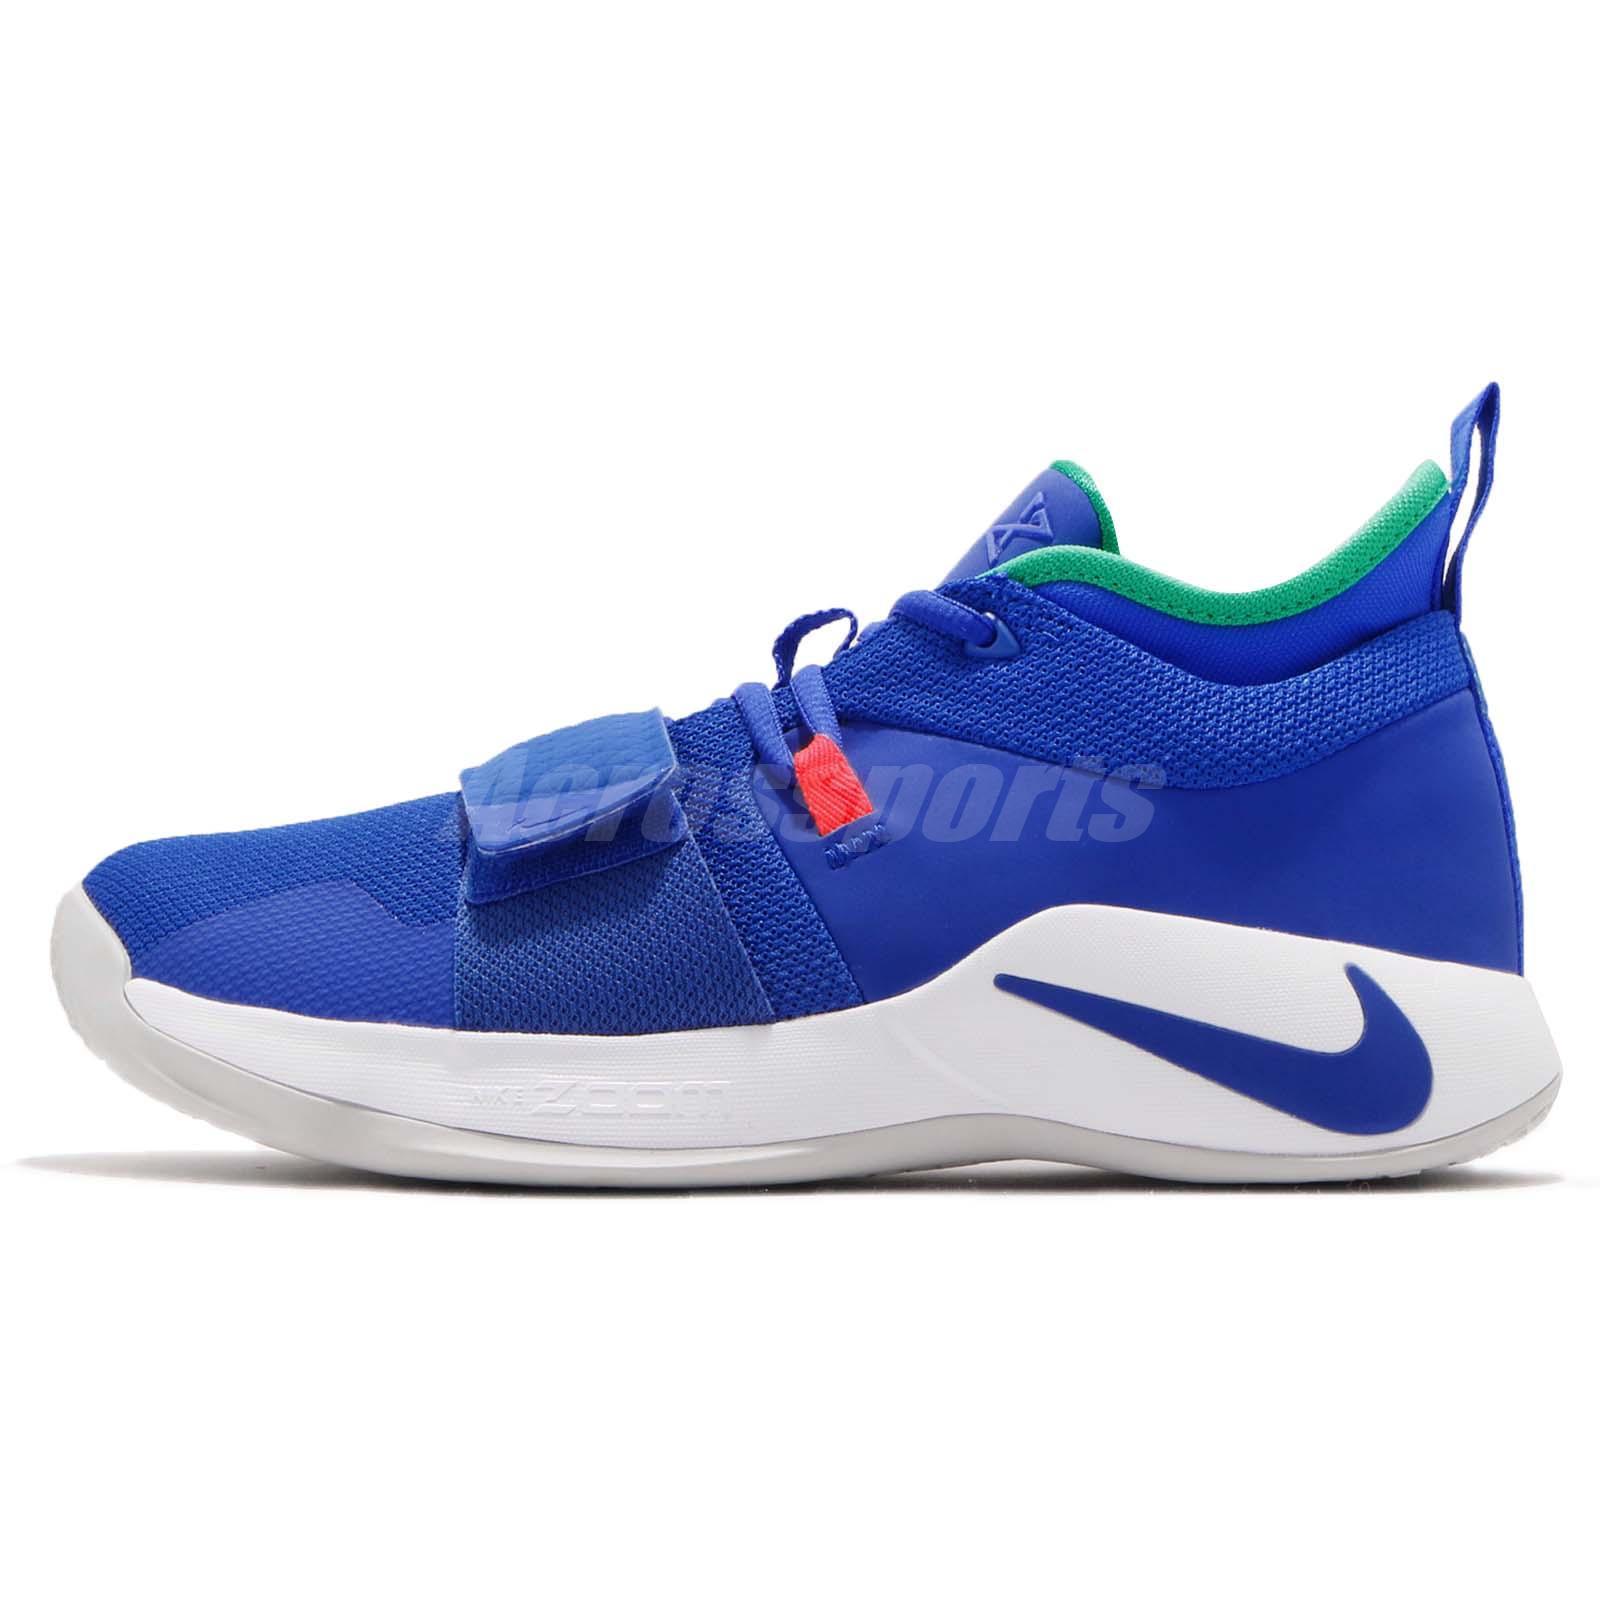 c300f0c3aee Nike PG 2.5 EP Paul George Fortnite Racer Blue Men Basketball Shoes BQ8453- 401